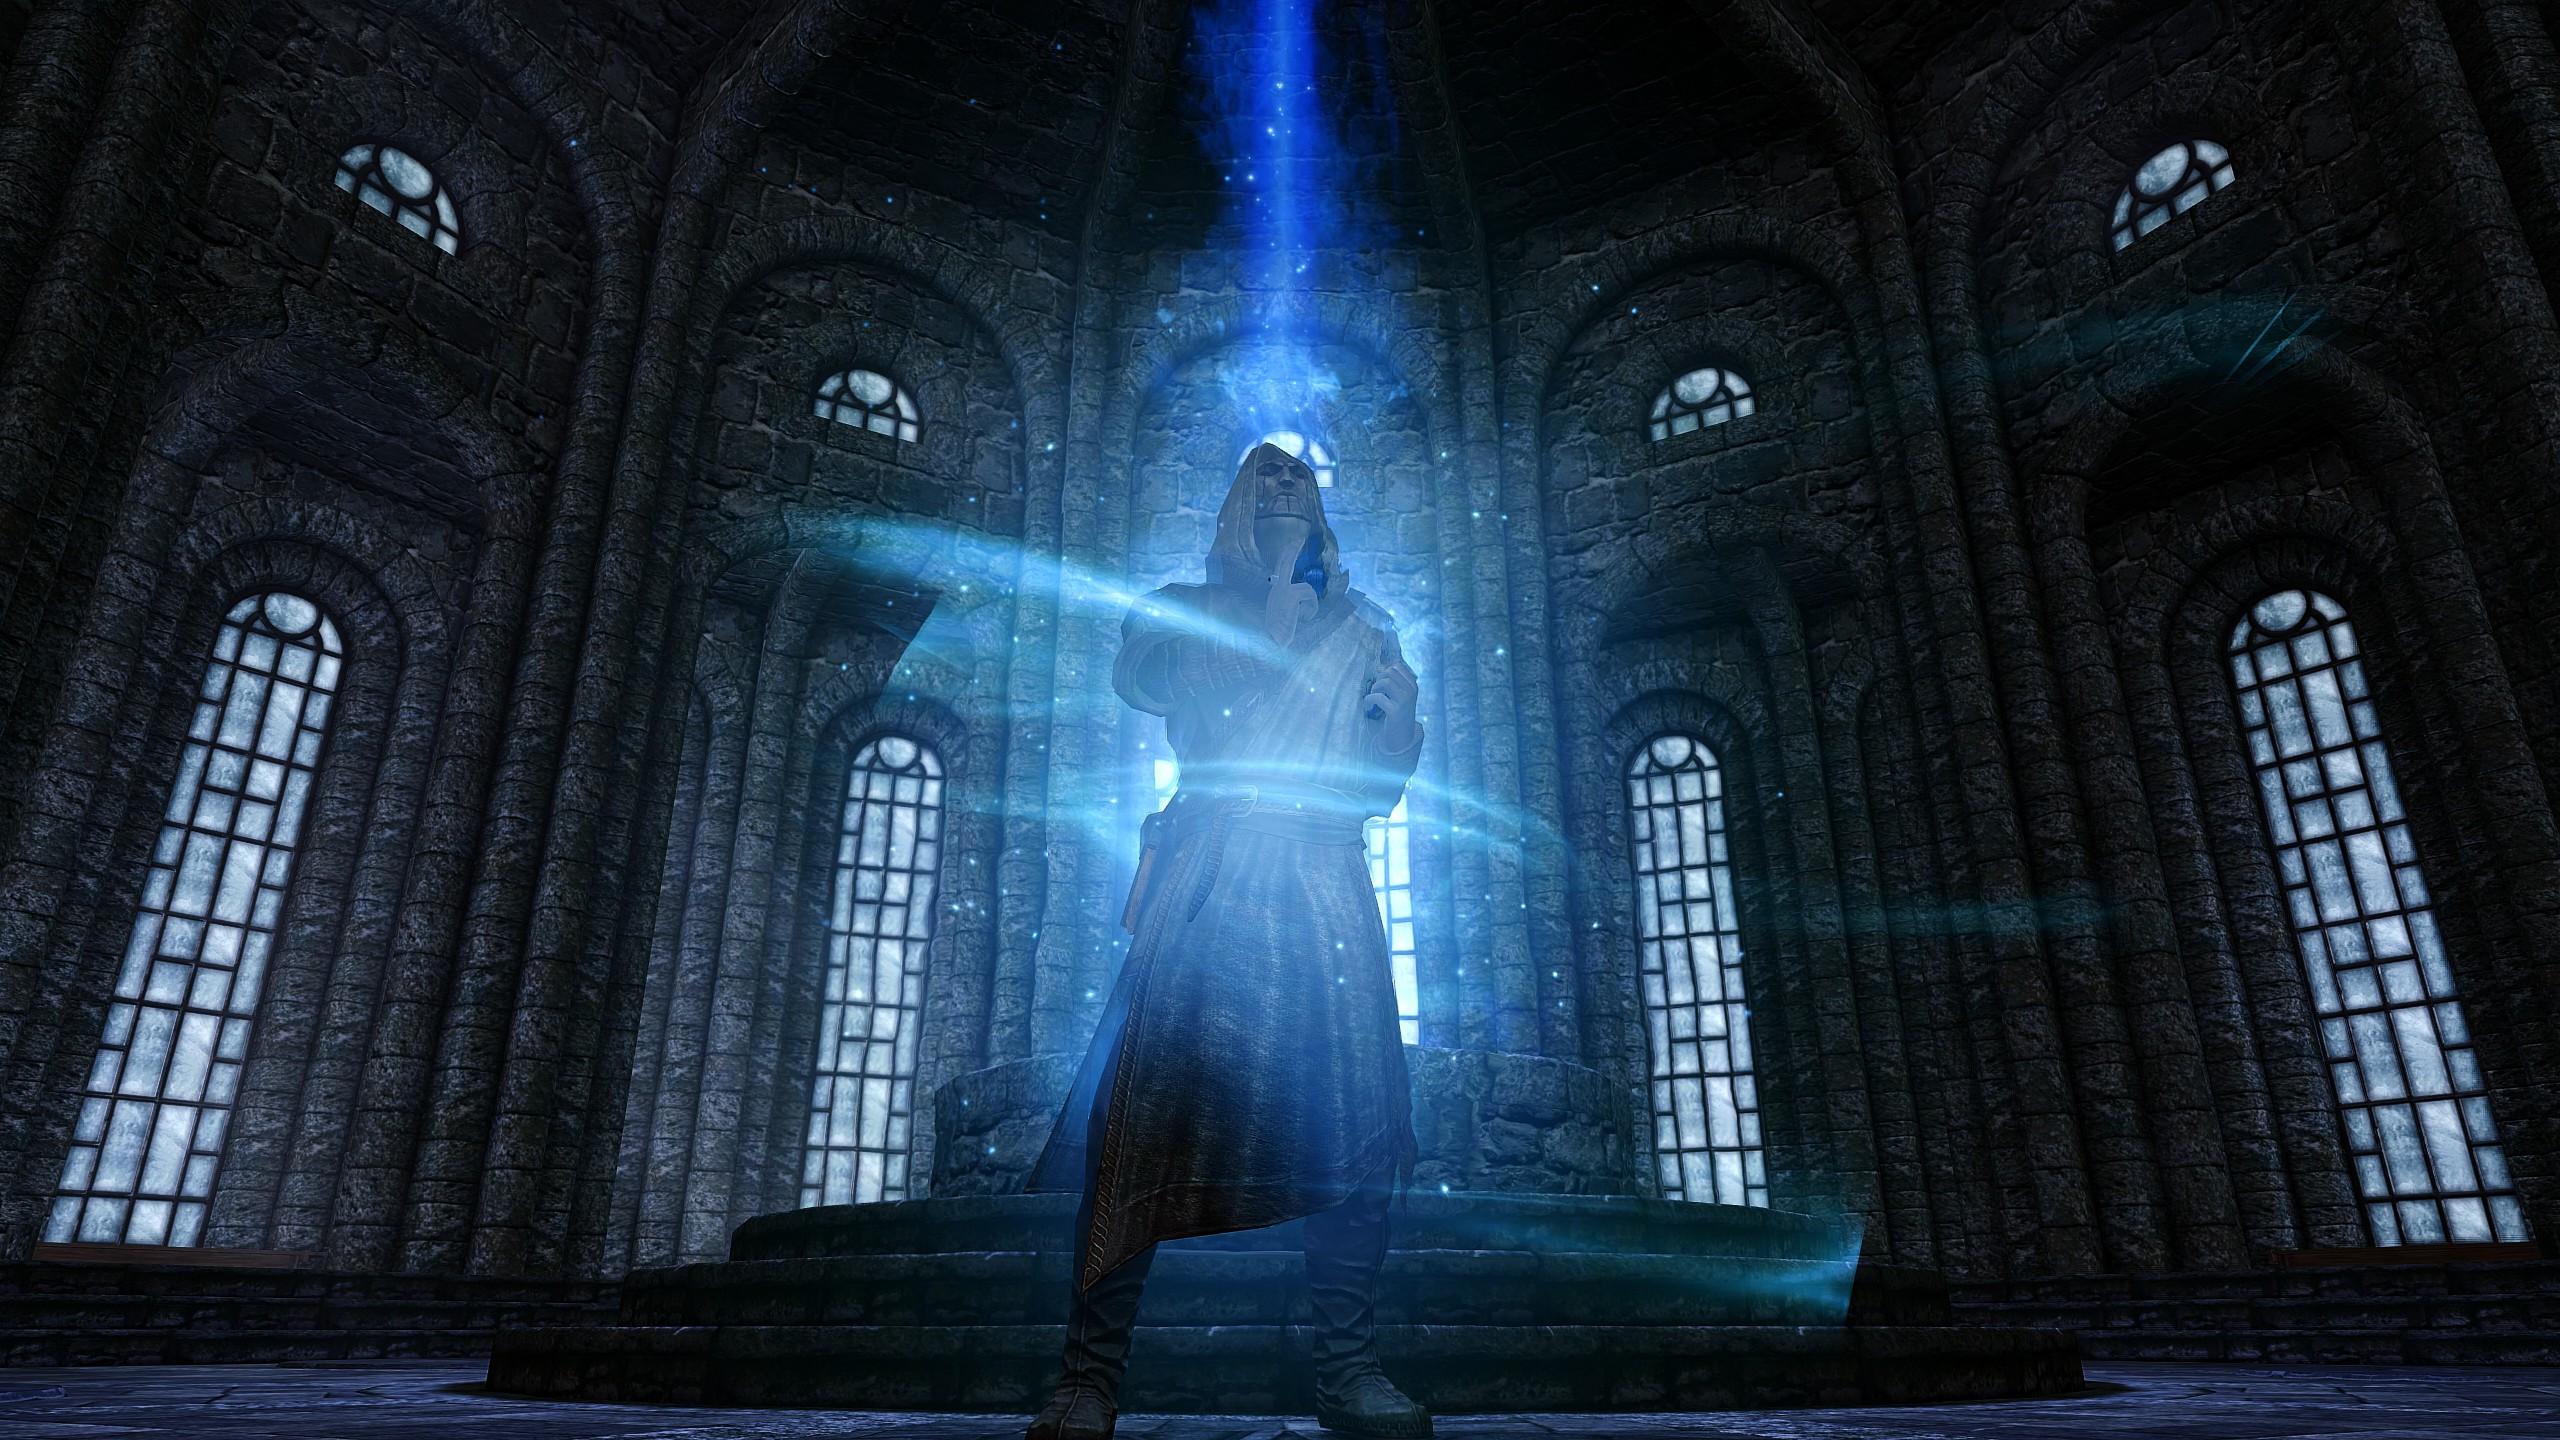 The best Skyrim mods